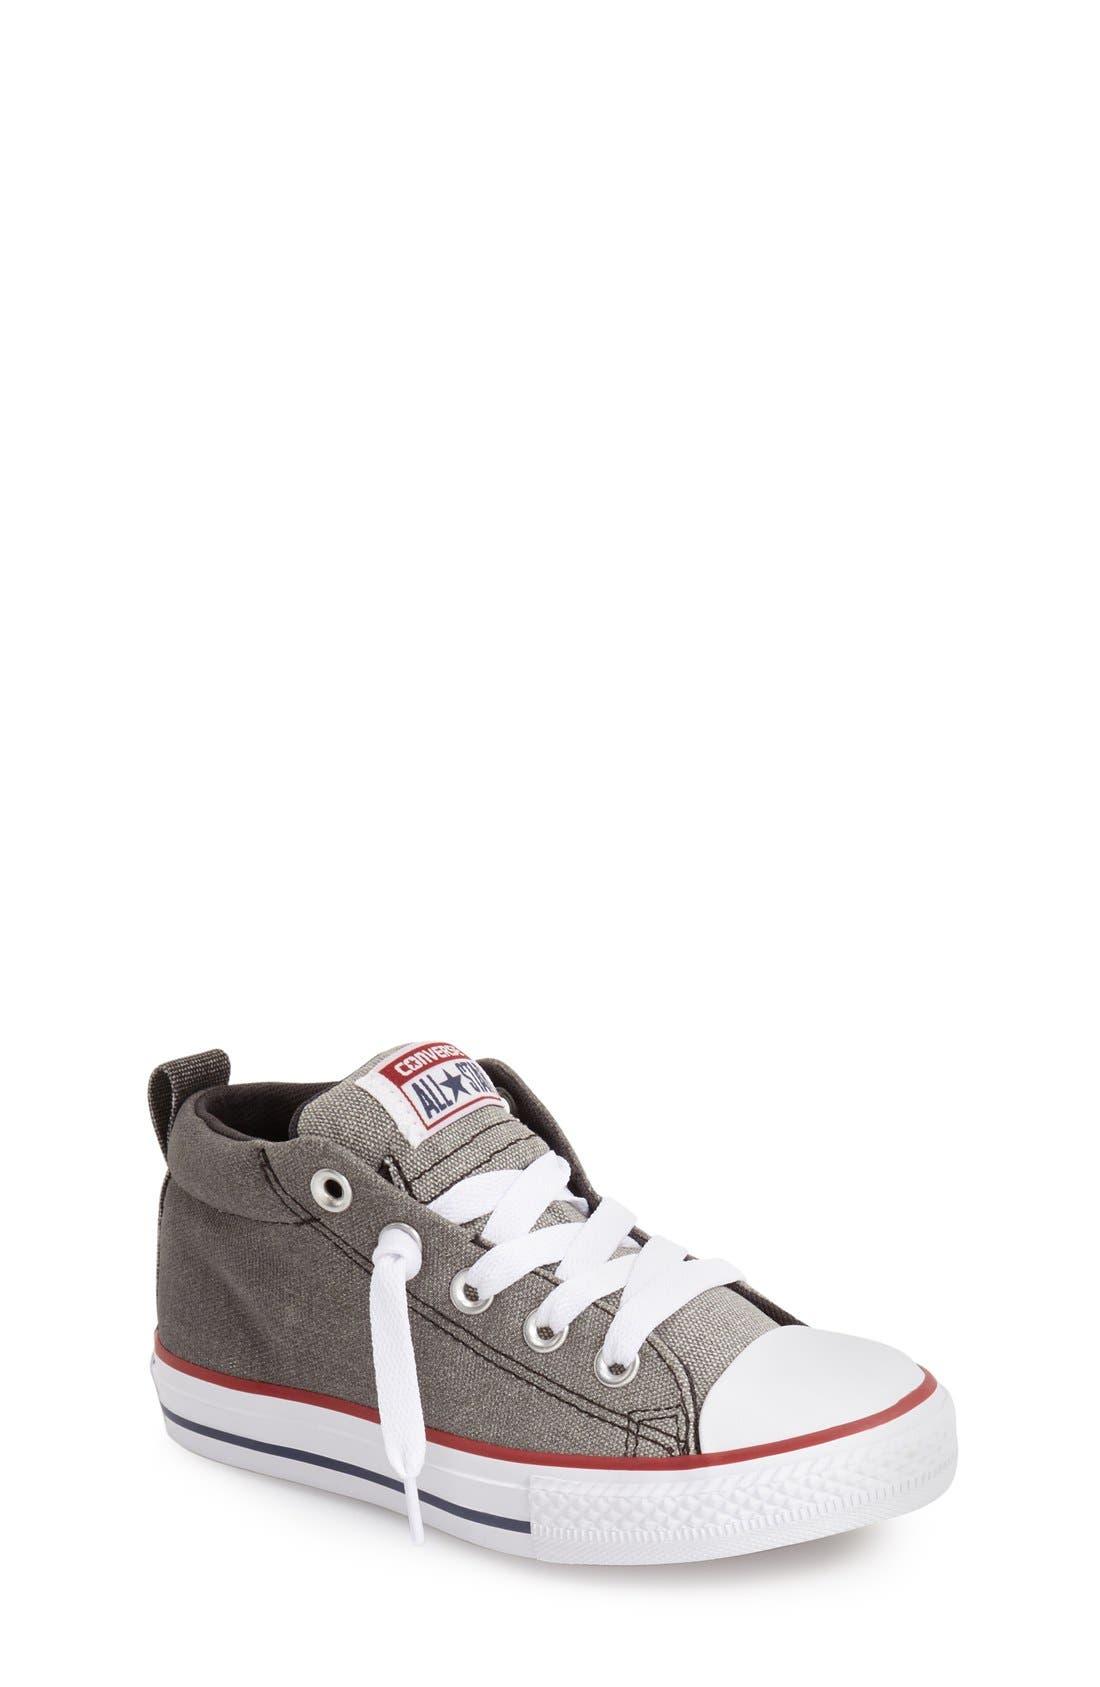 Main Image - Converse Chuck Taylor® All Star® 'CTAS Street' Mid Sneaker (Baby, Walker, Toddler Little Kid & Big Kid)